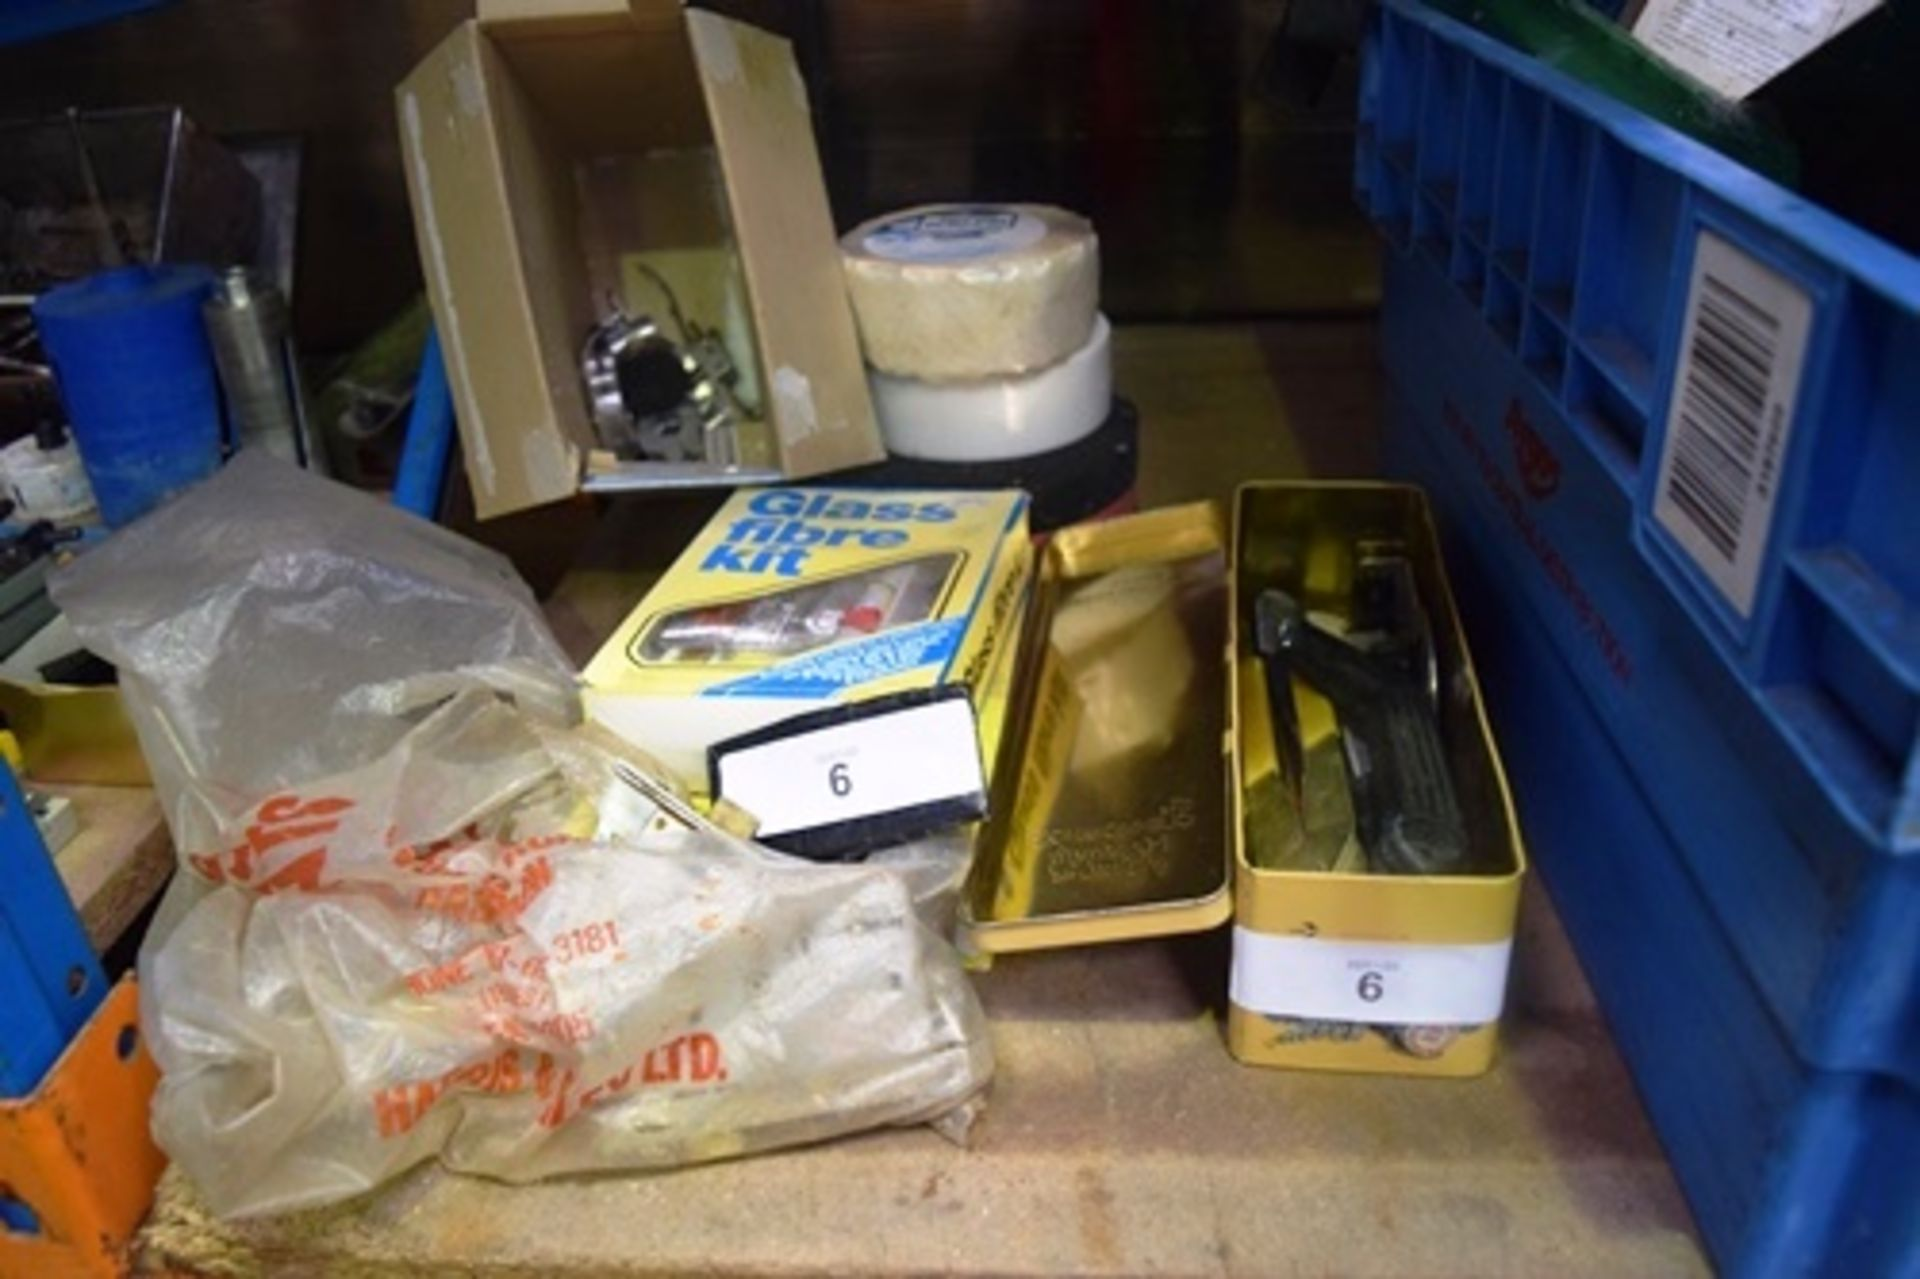 Lot 6 - 2 x glass fibre kits, 3 x assorted rolls of plastering interest, assorted door locks etc. - Second-